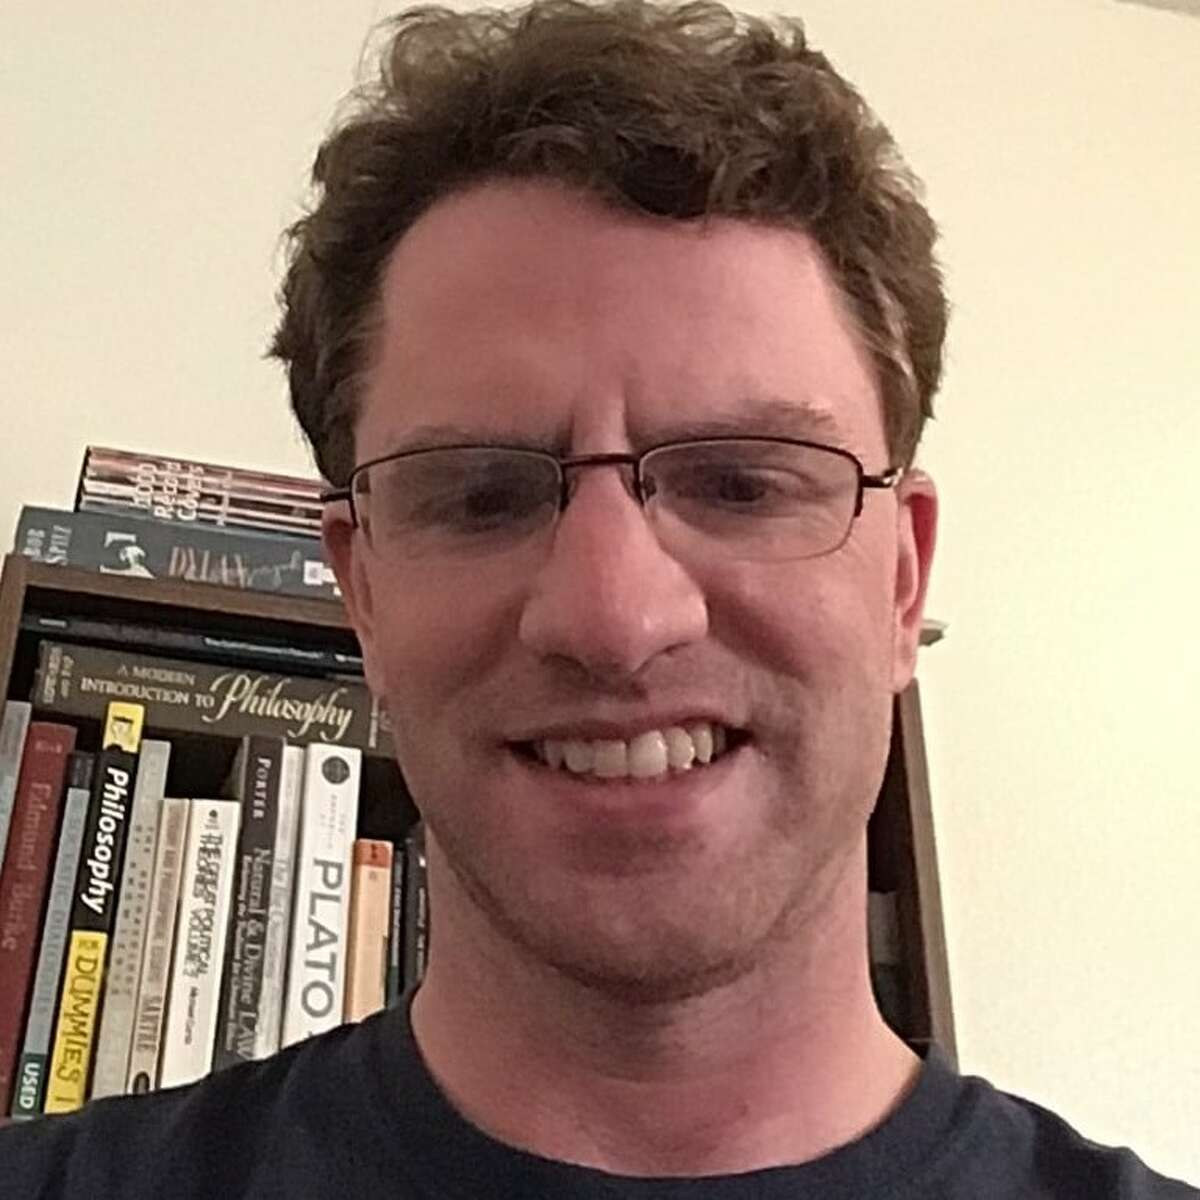 Sean Donovan Ditmore, 33